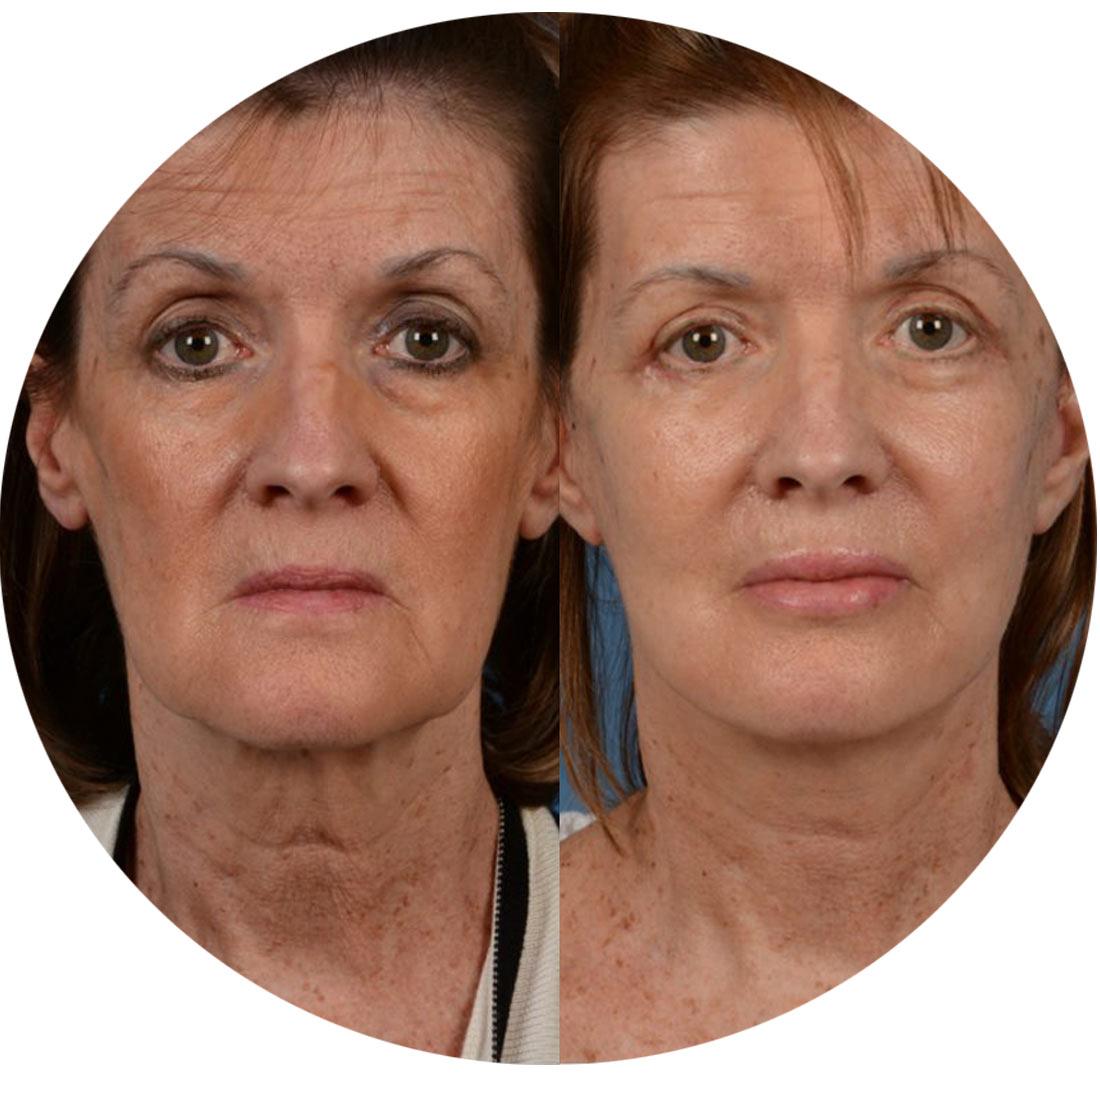 Facial-fat-injection